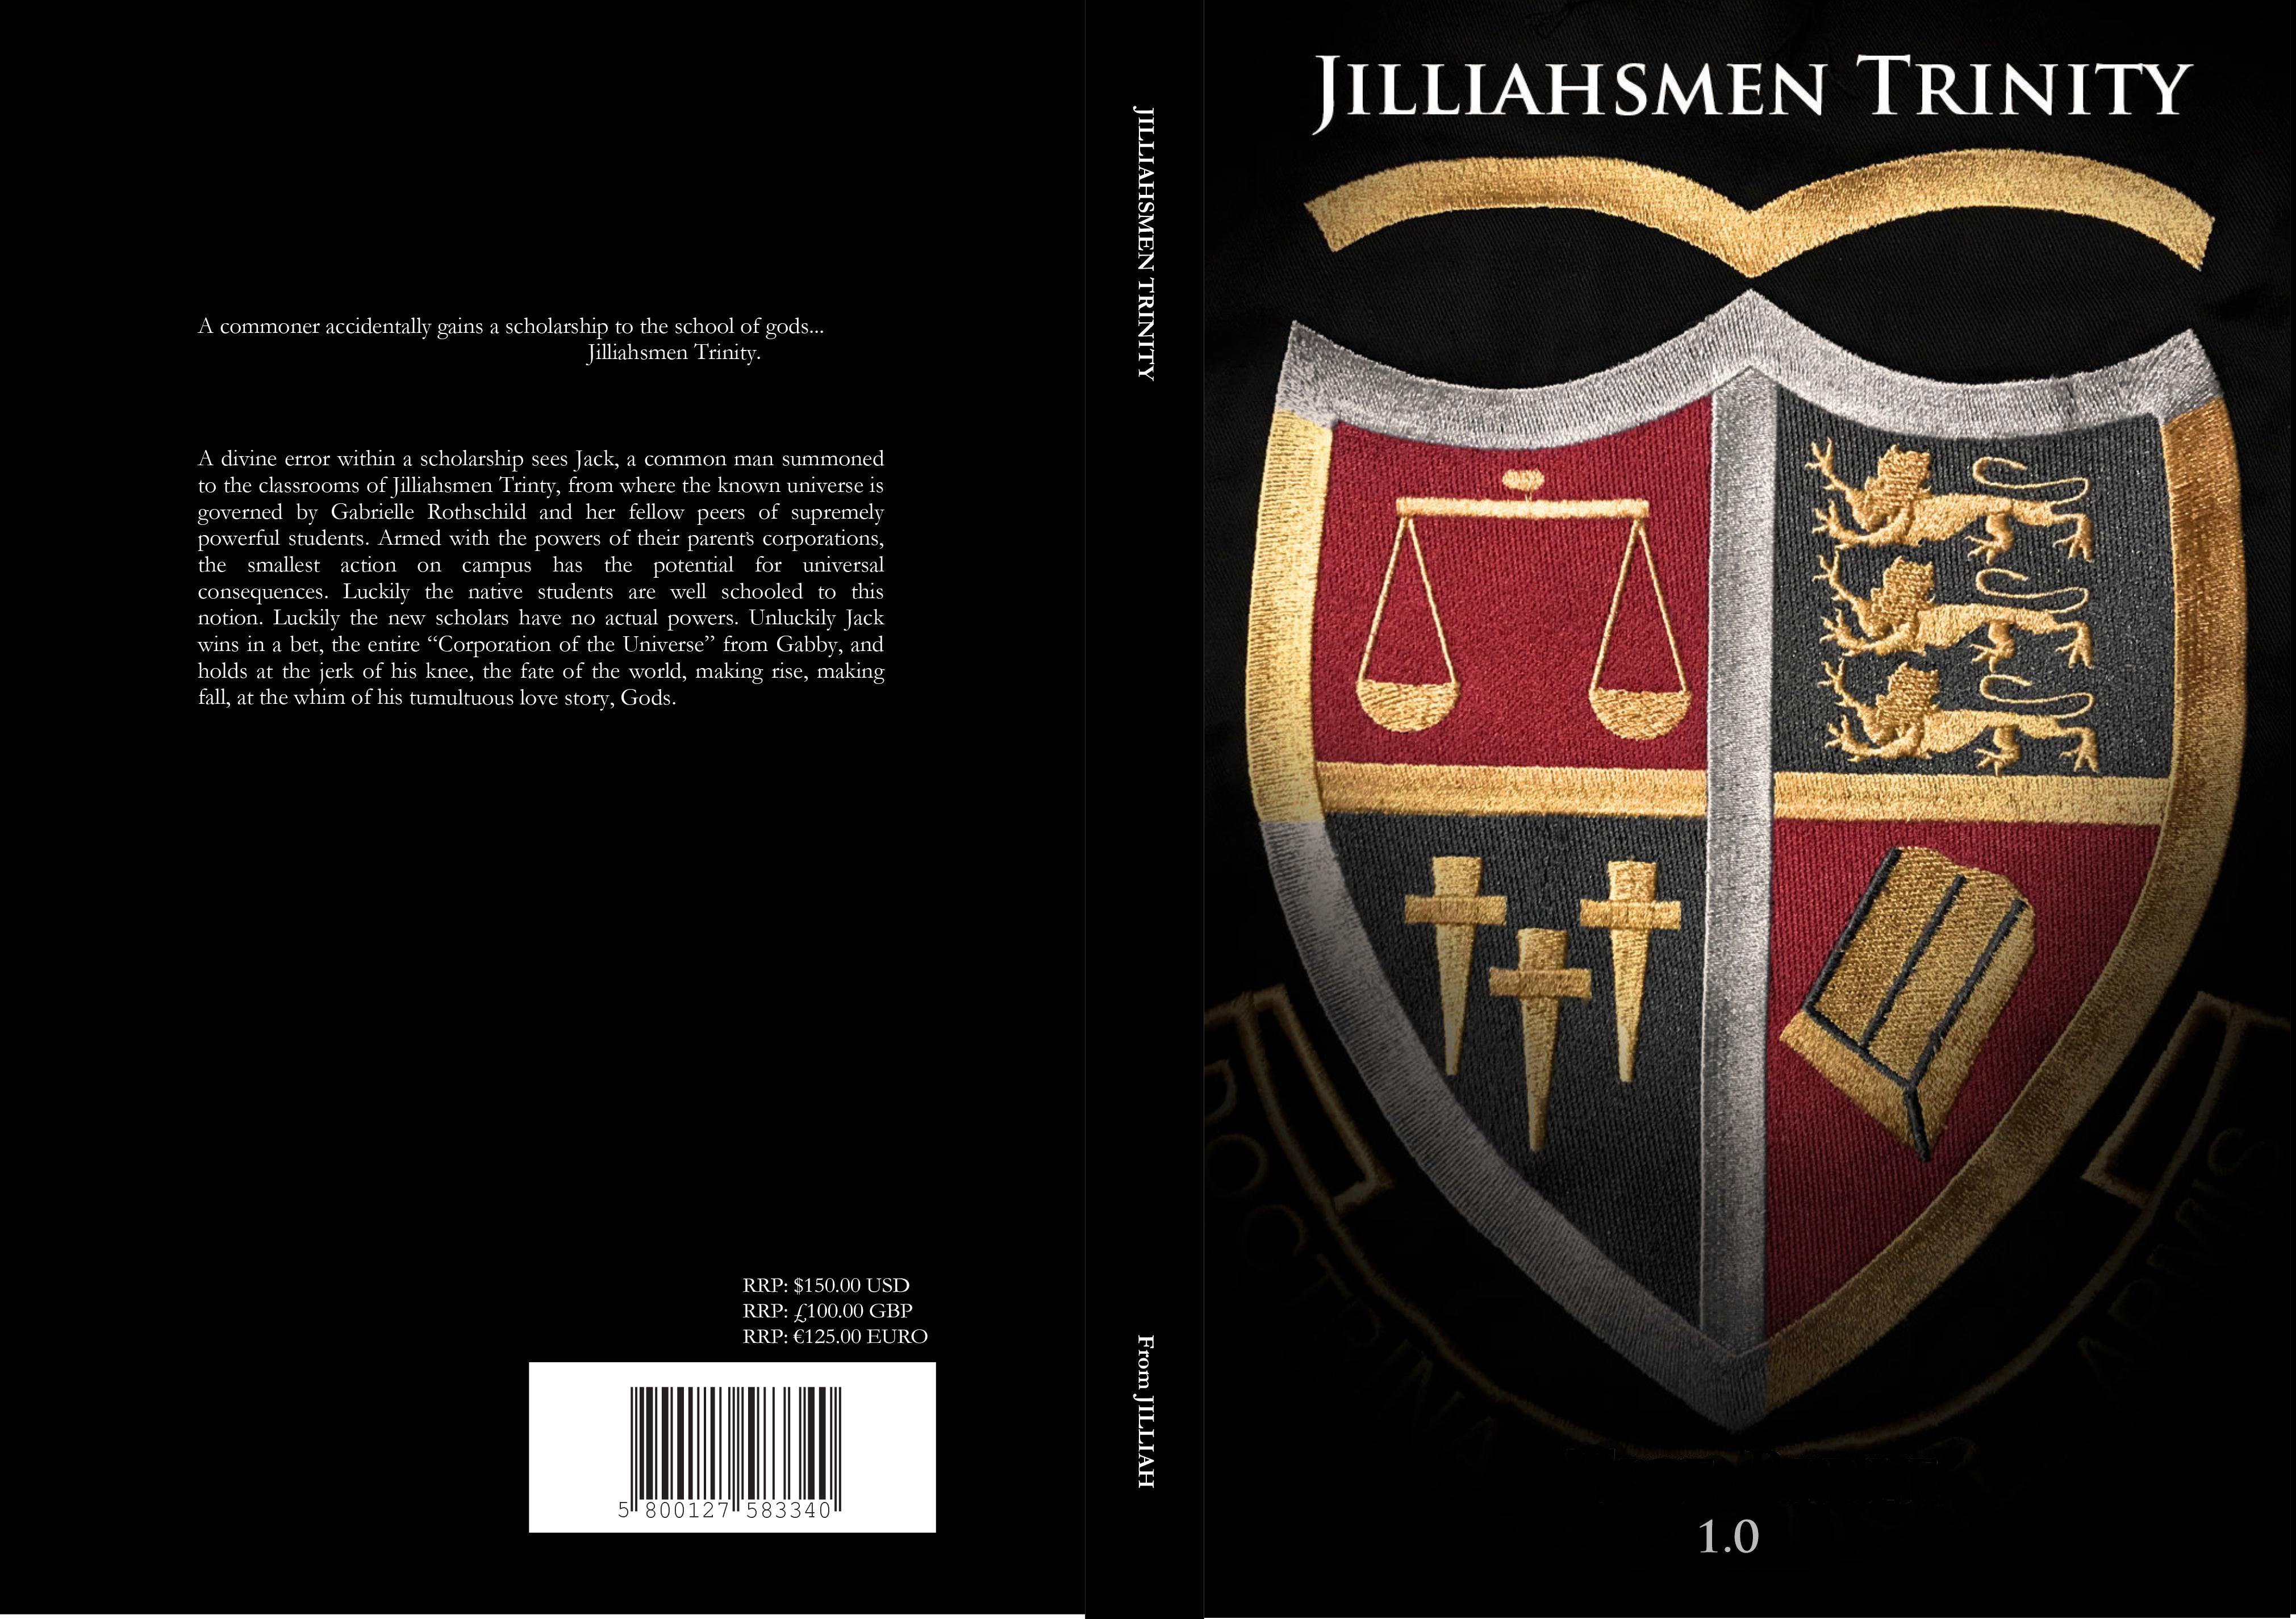 Peter Jackson vs Guy Ritchie vs Baz Lurhamn for the World Heavyweight Jilliahsmen Trinity Directorship!